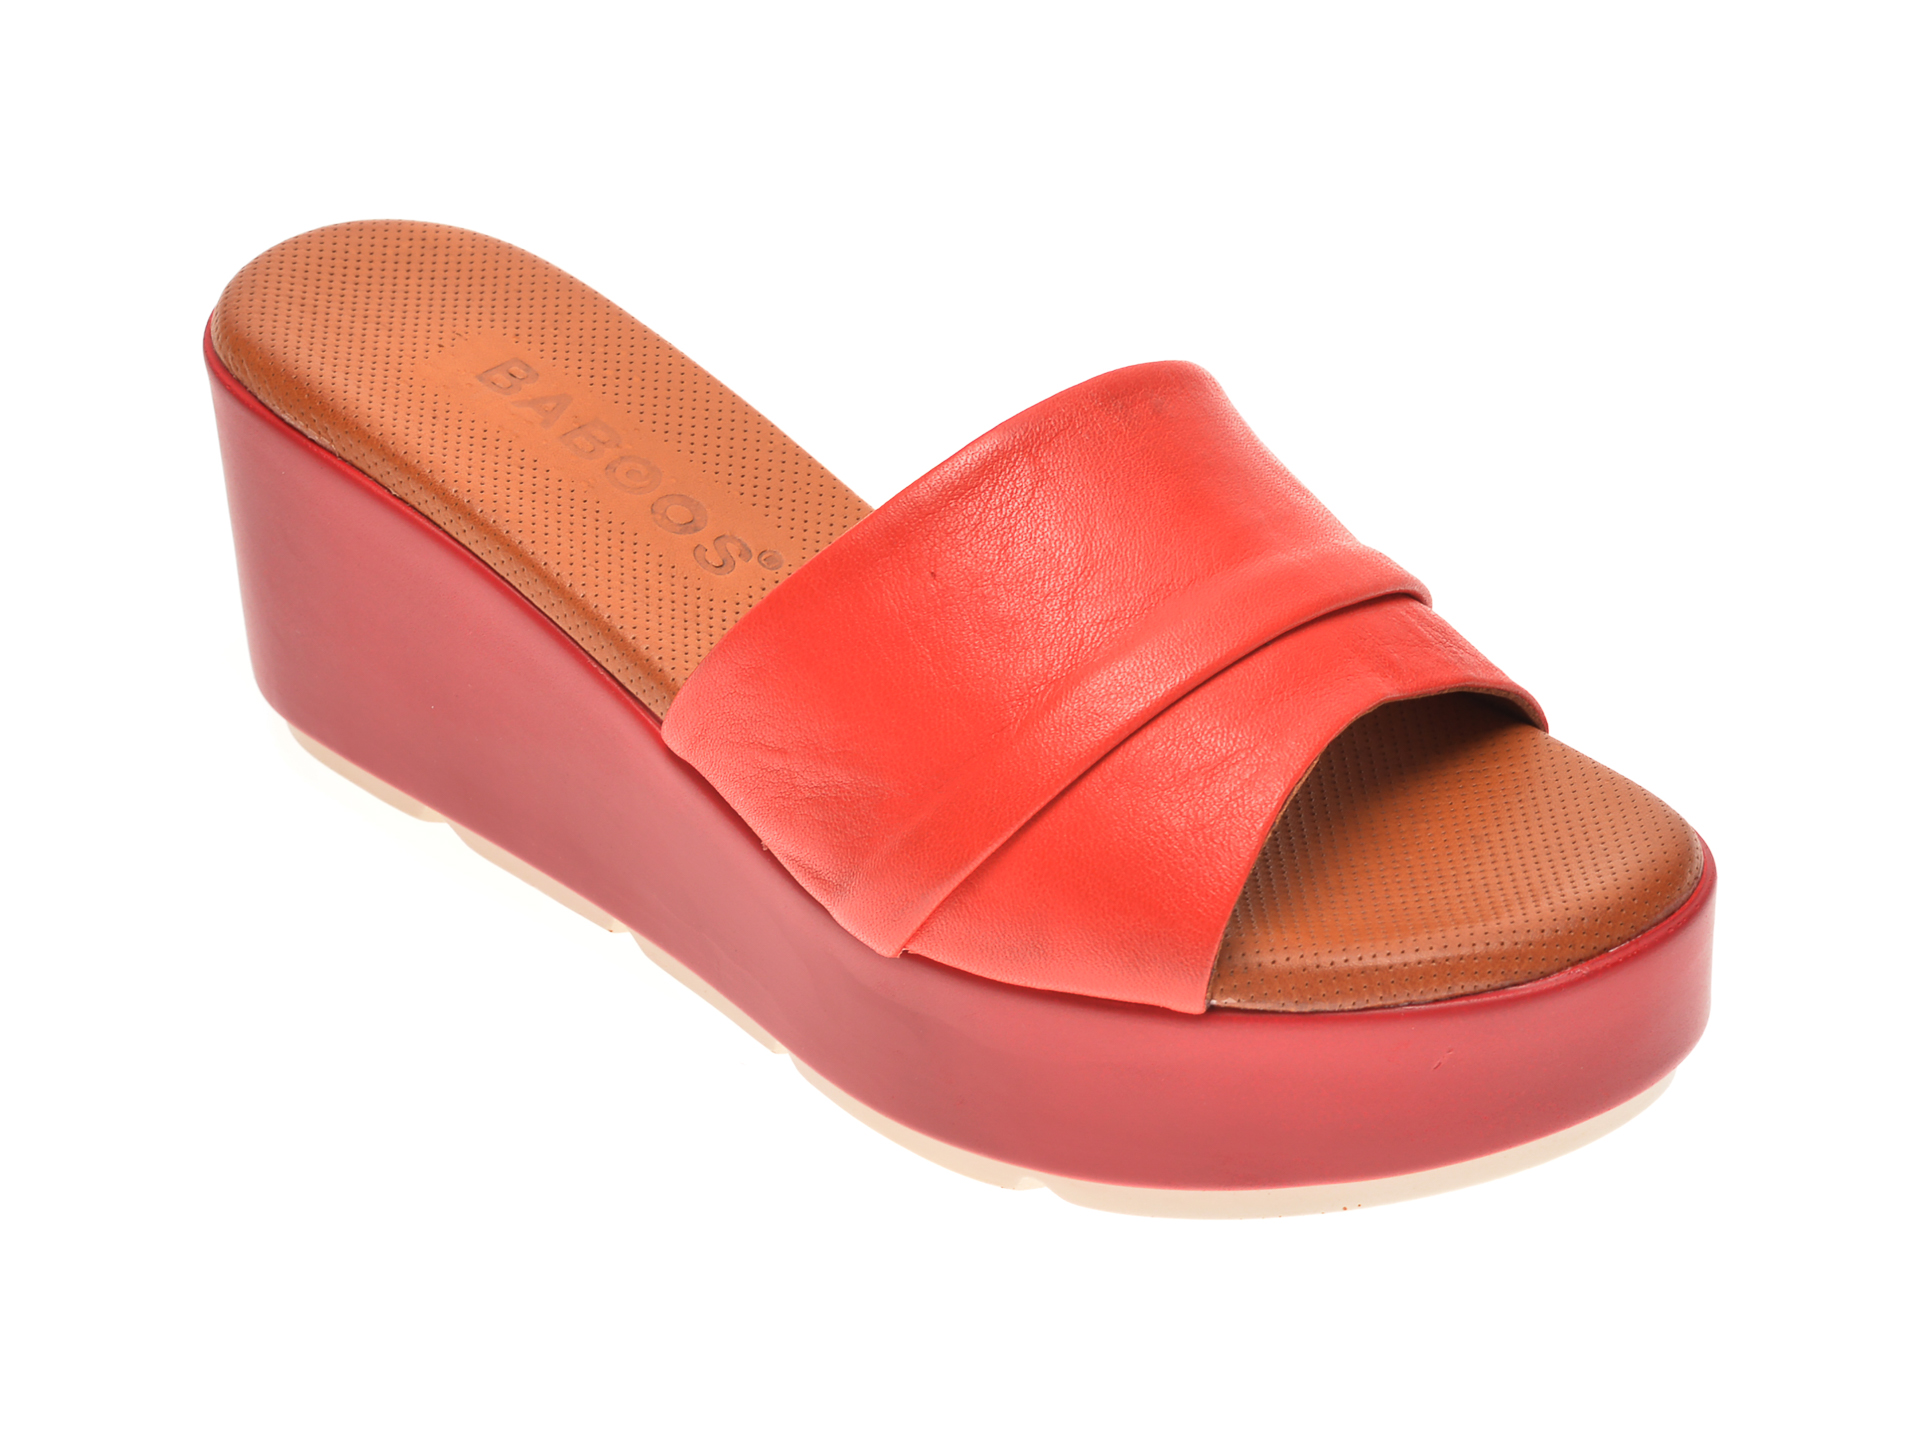 Papuci BABOOS rosii, 2517, din piele naturala